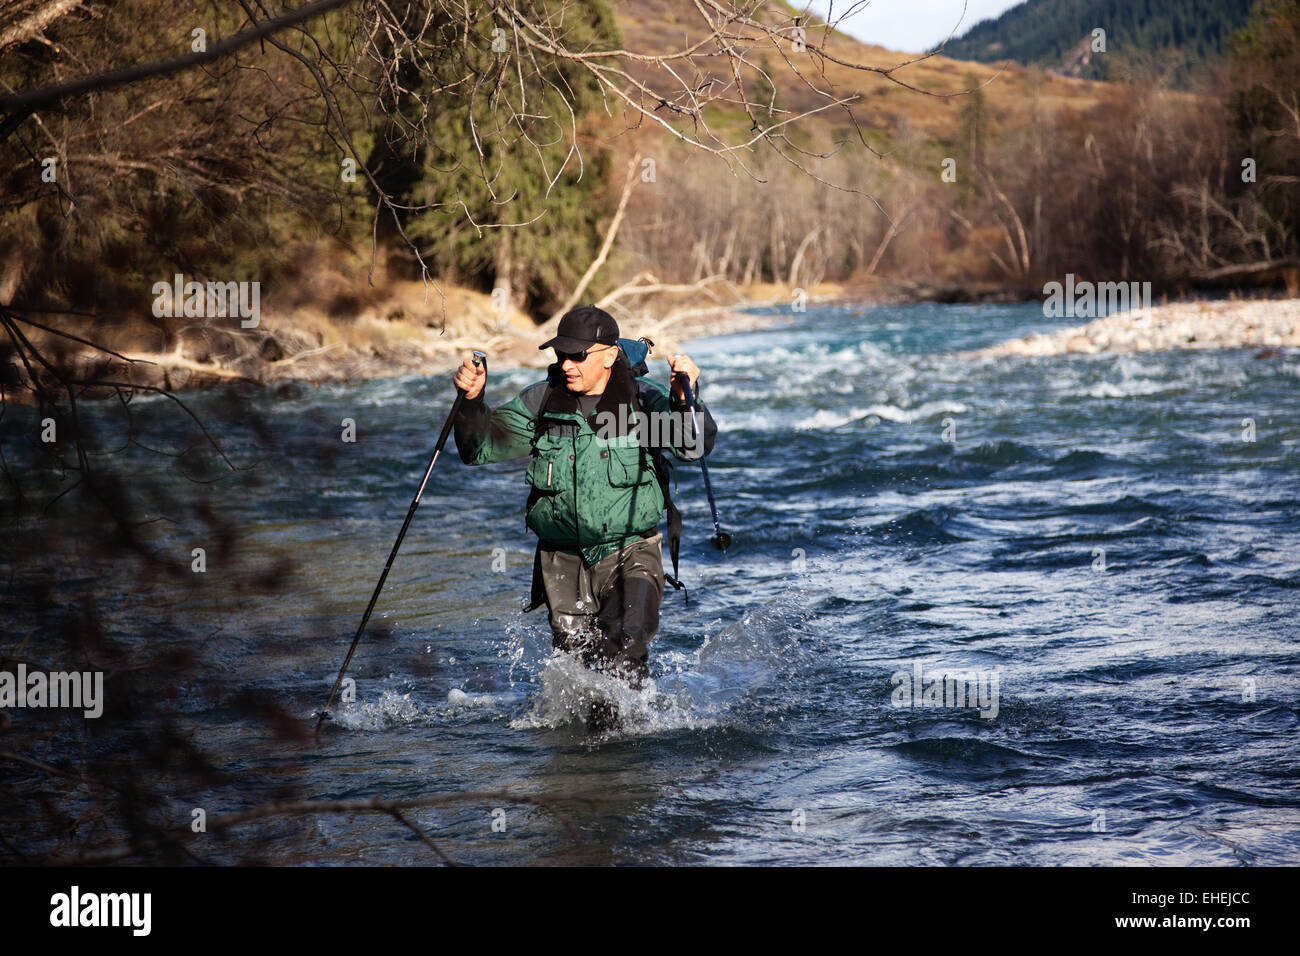 Backpacker wade rugged river - Stock Image